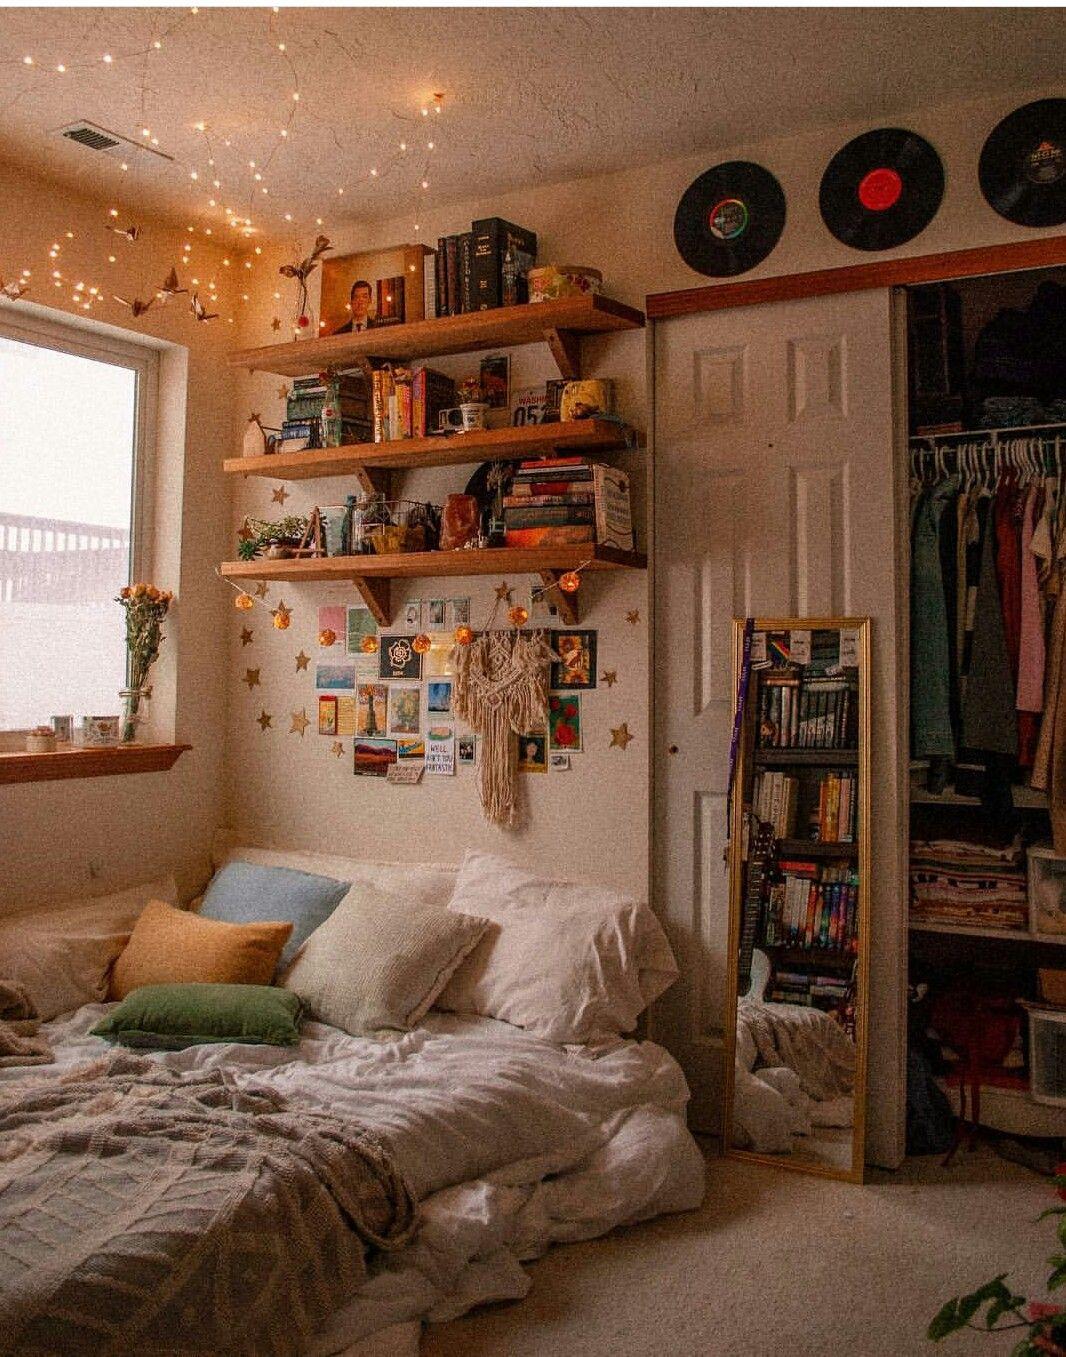 pinosheen sajid on decore  aesthetic bedroom room